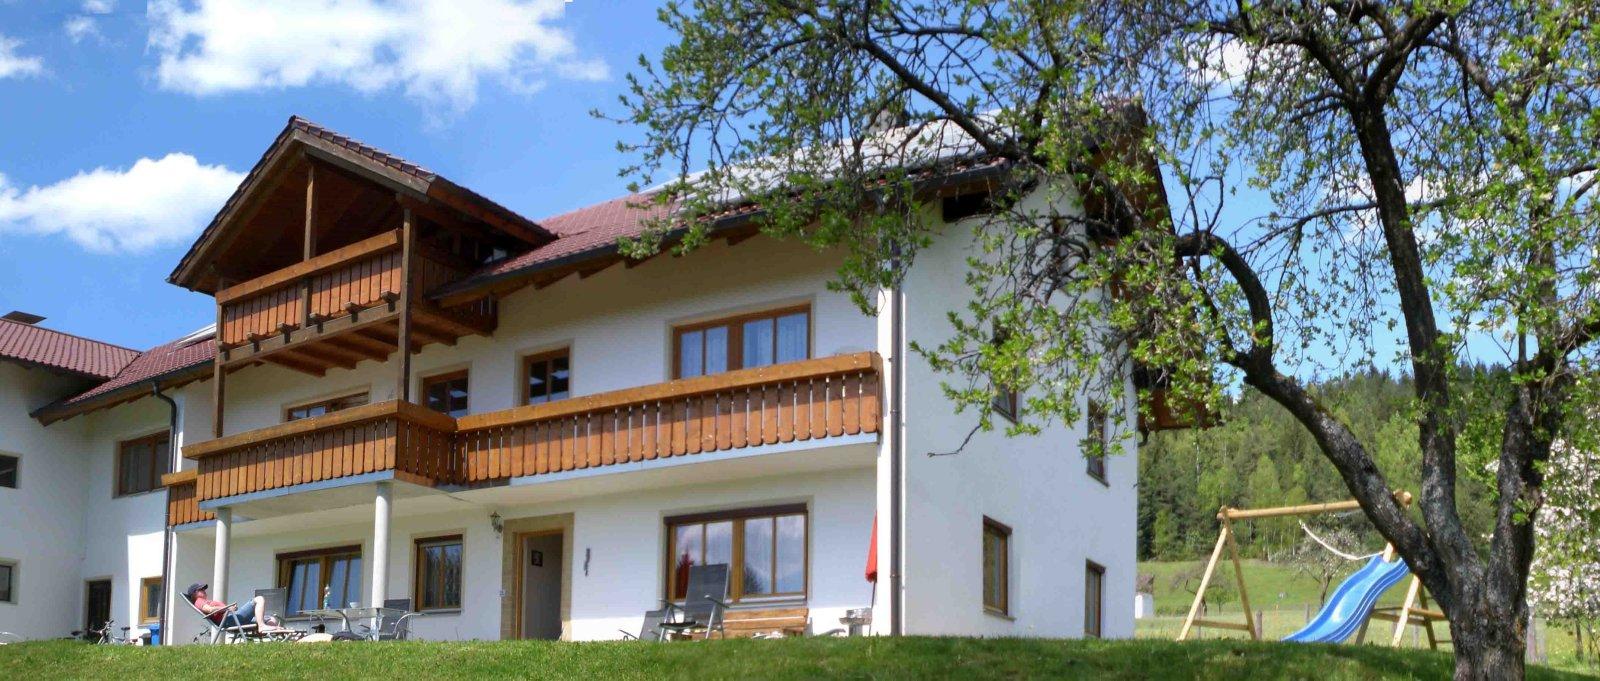 Ferienhaus Hamberger in Kaikenried – Kontakt